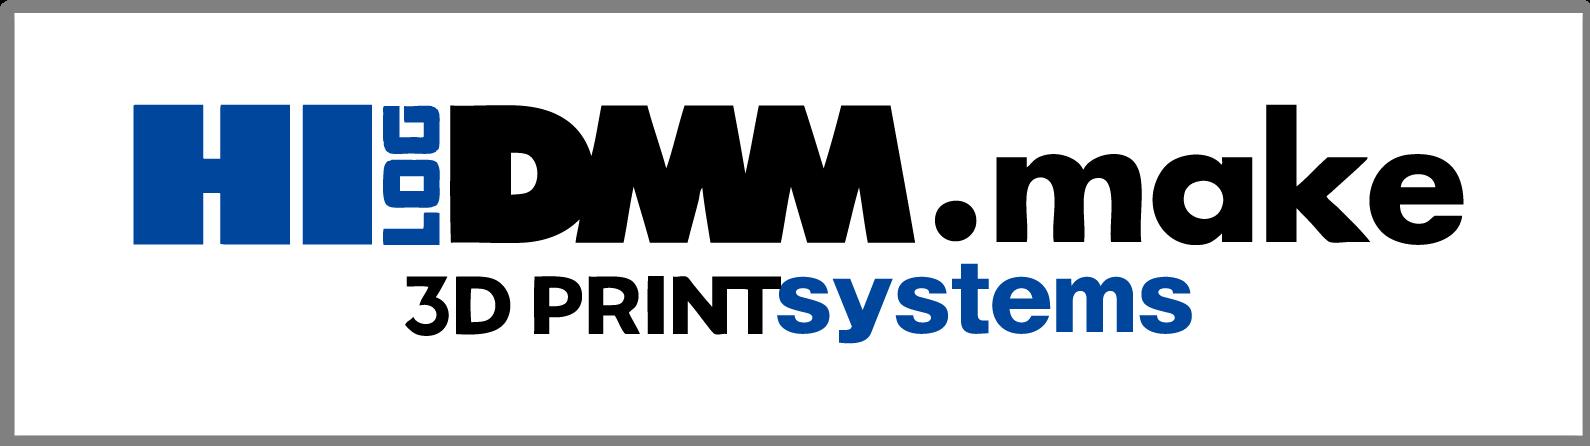 DMM.make 3D HILOGsystems 電動ガン パーツ 選び 価格 最安値 ショッピングサイト Amazon Yahoo 楽天 ケンサク=スムーズ